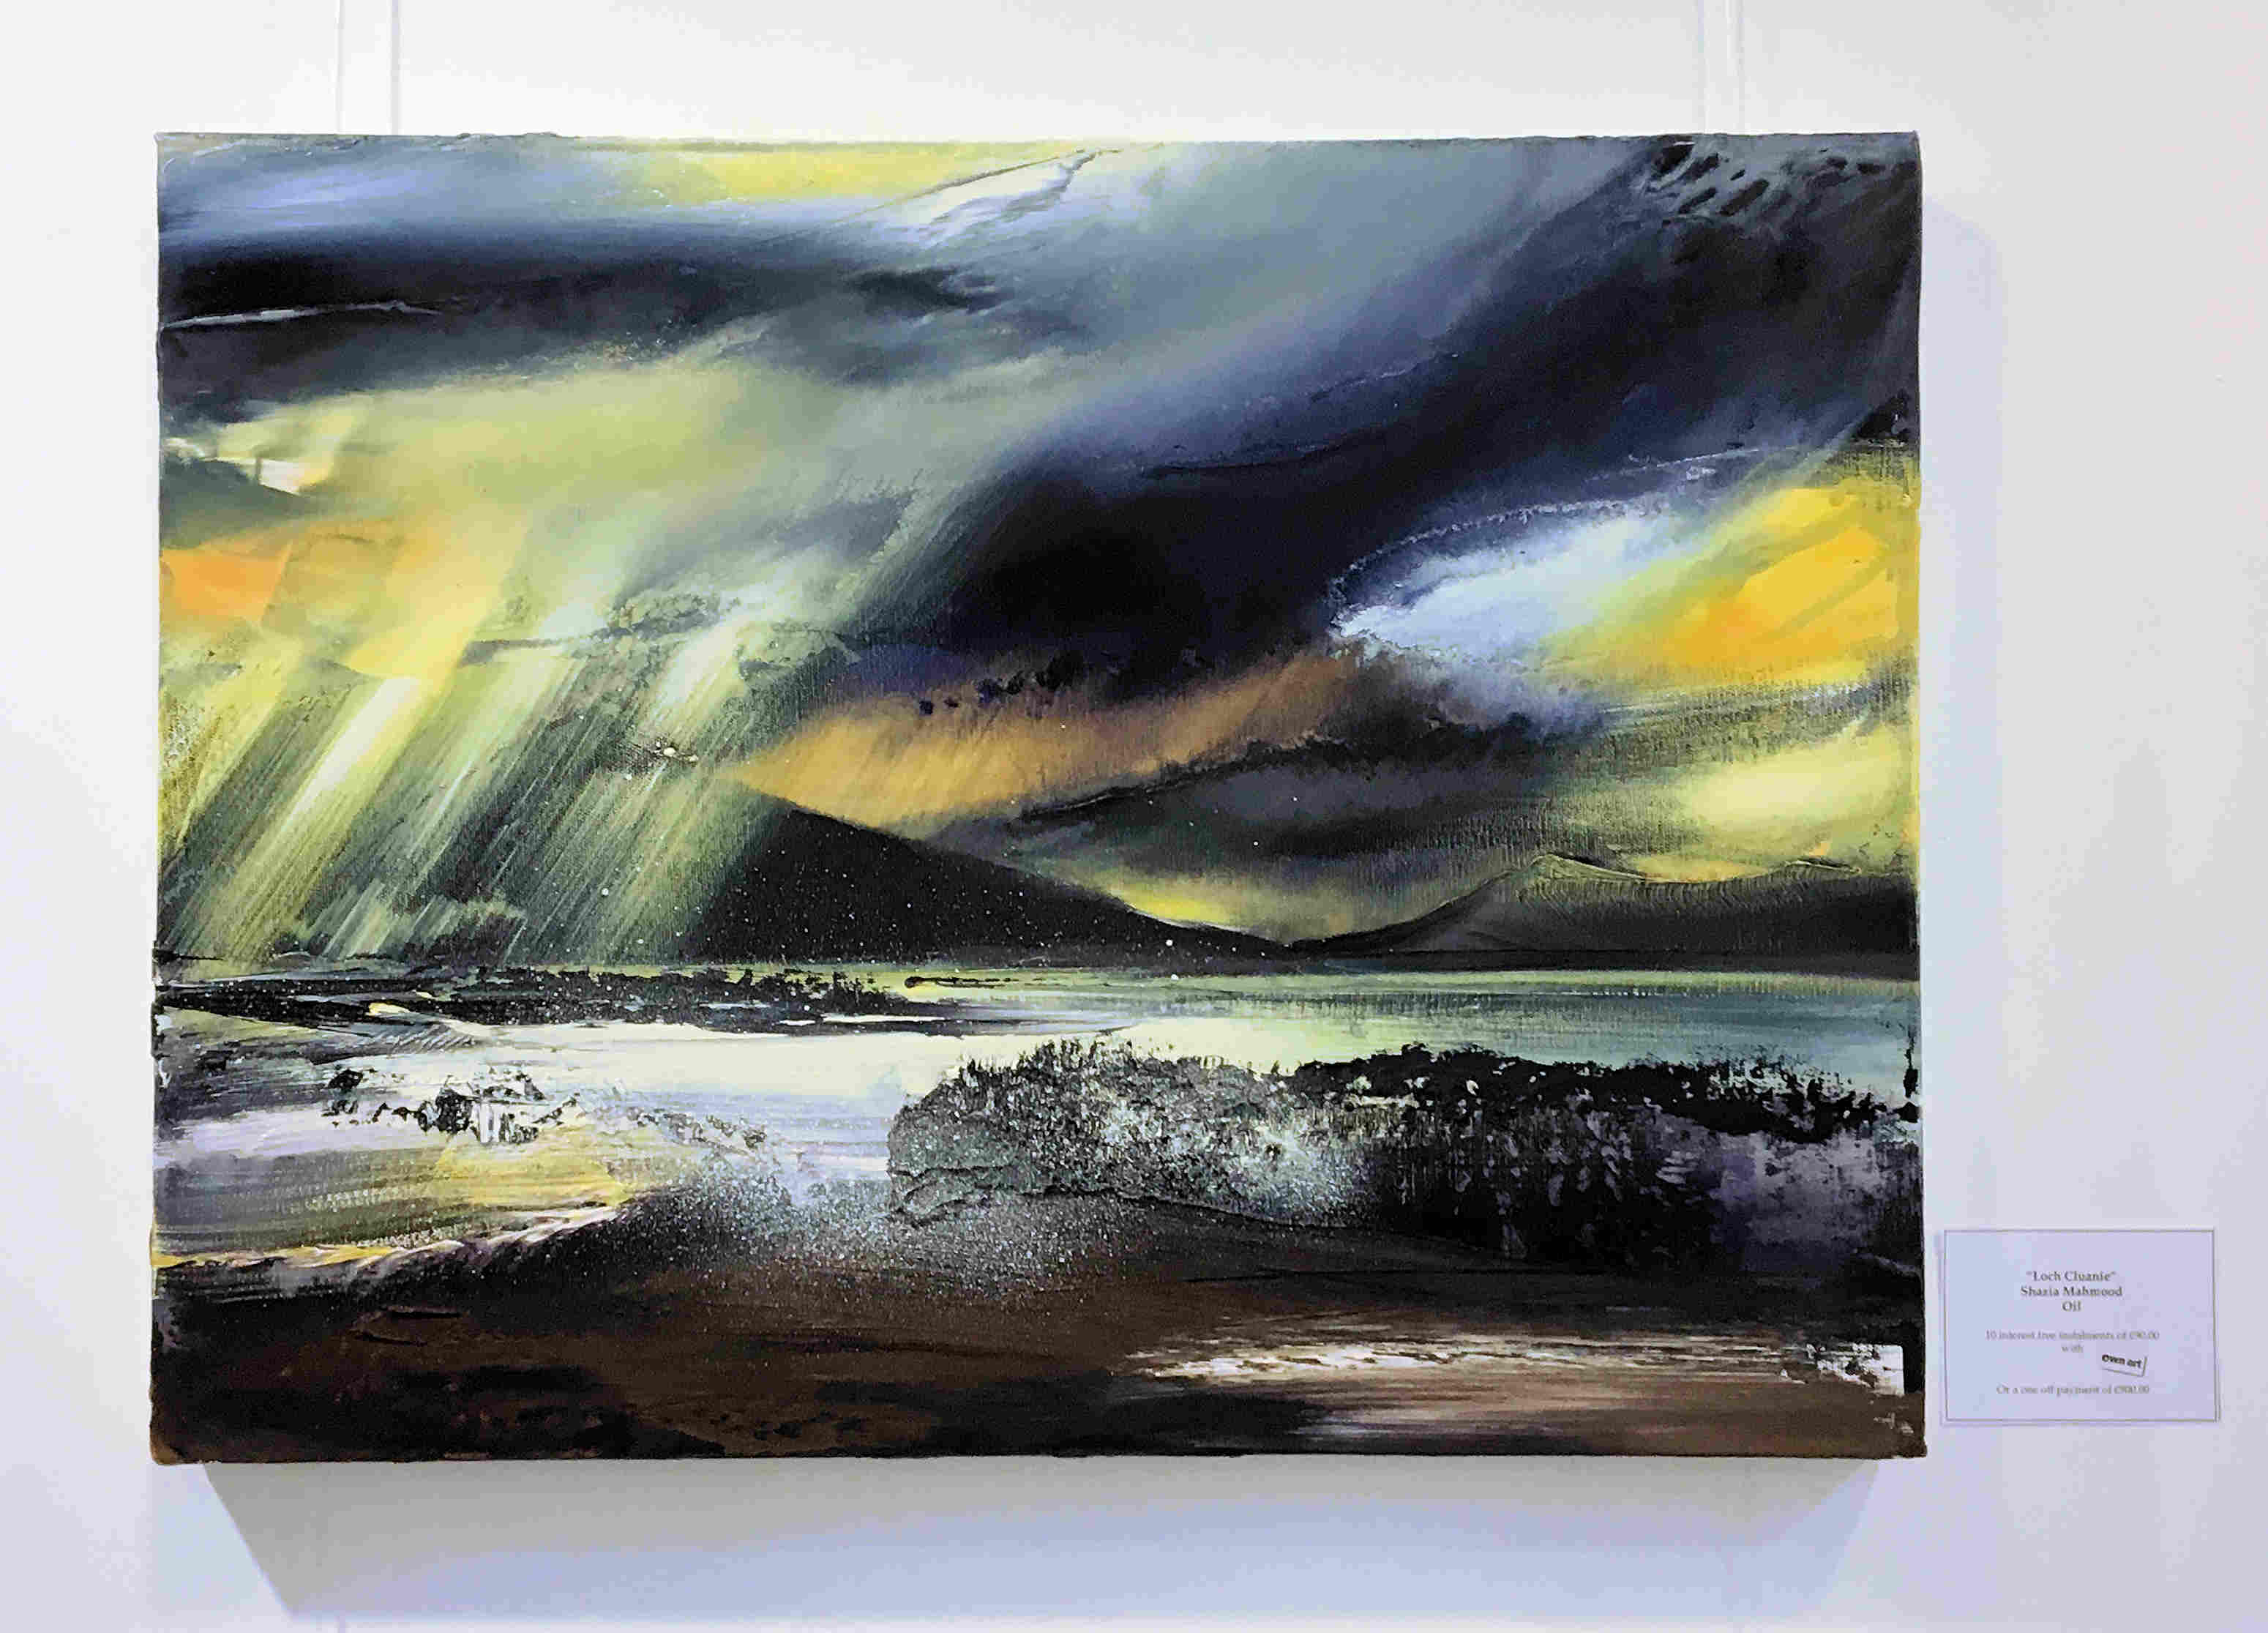 'Loch Cluanie' by artist Shazia Mahmood